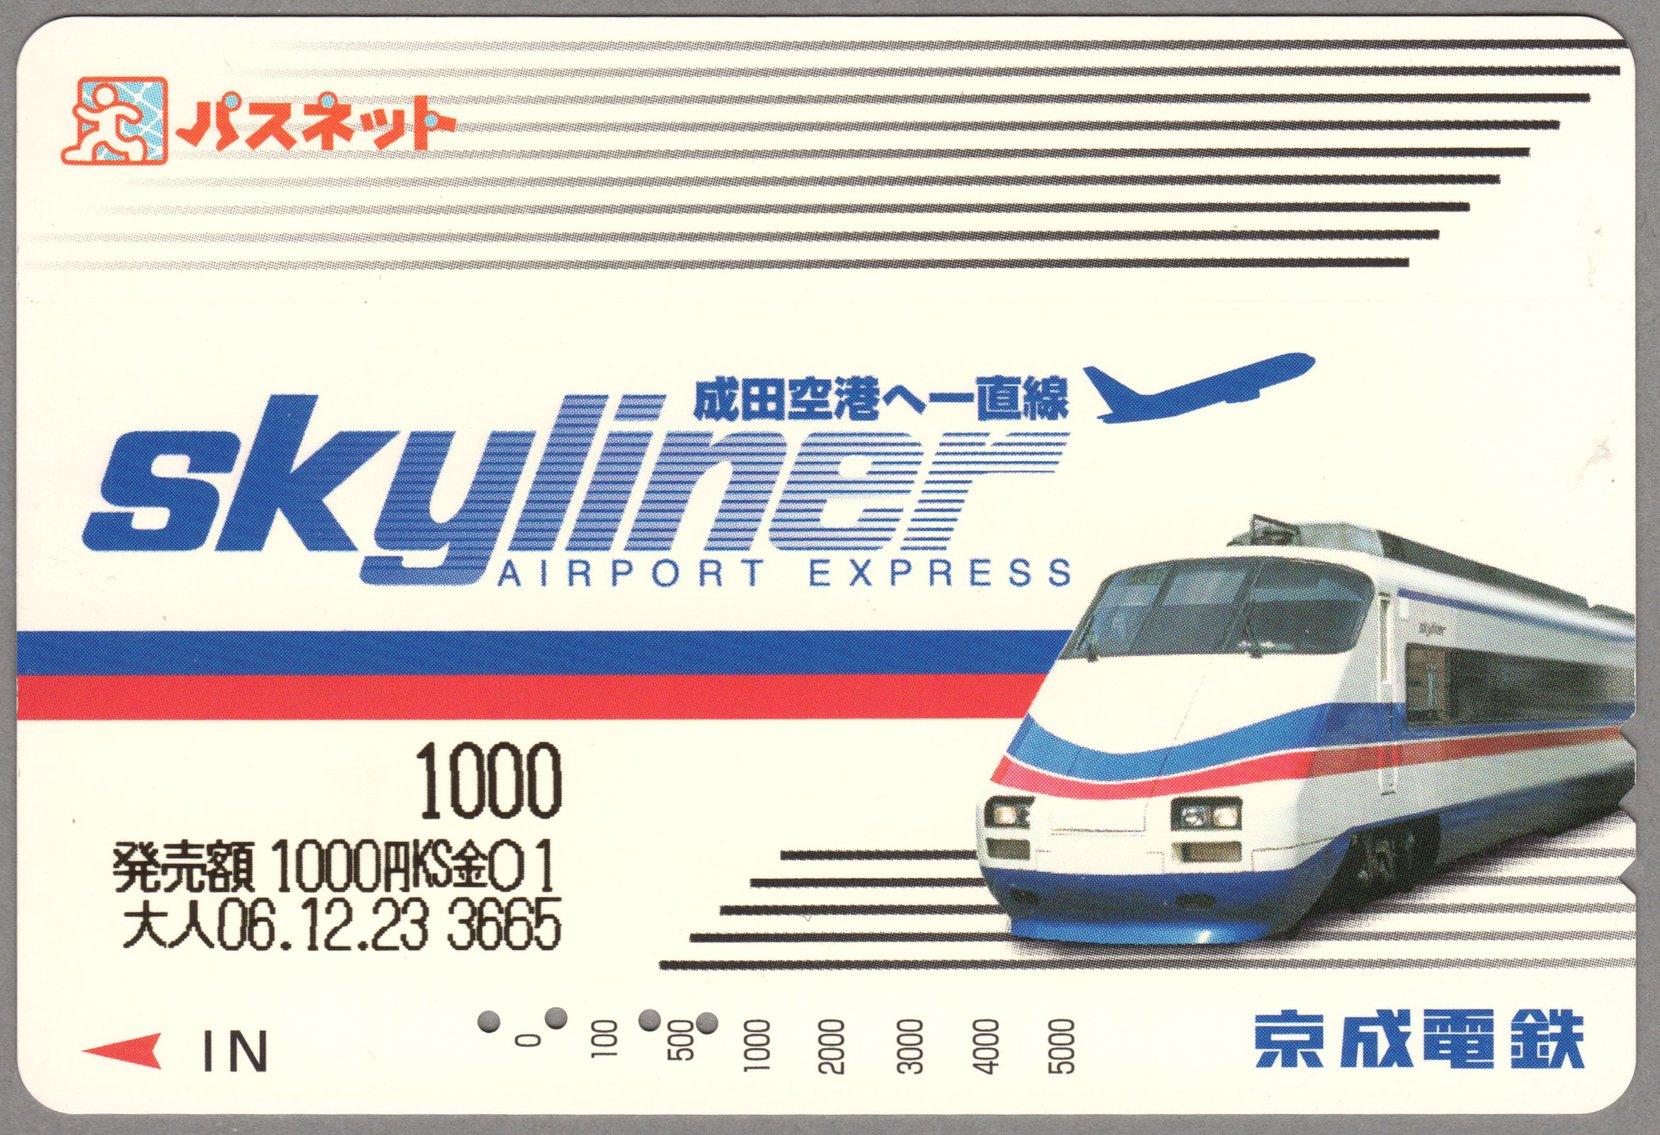 phonecard - skyliner airport express 1000 cards phone-cards